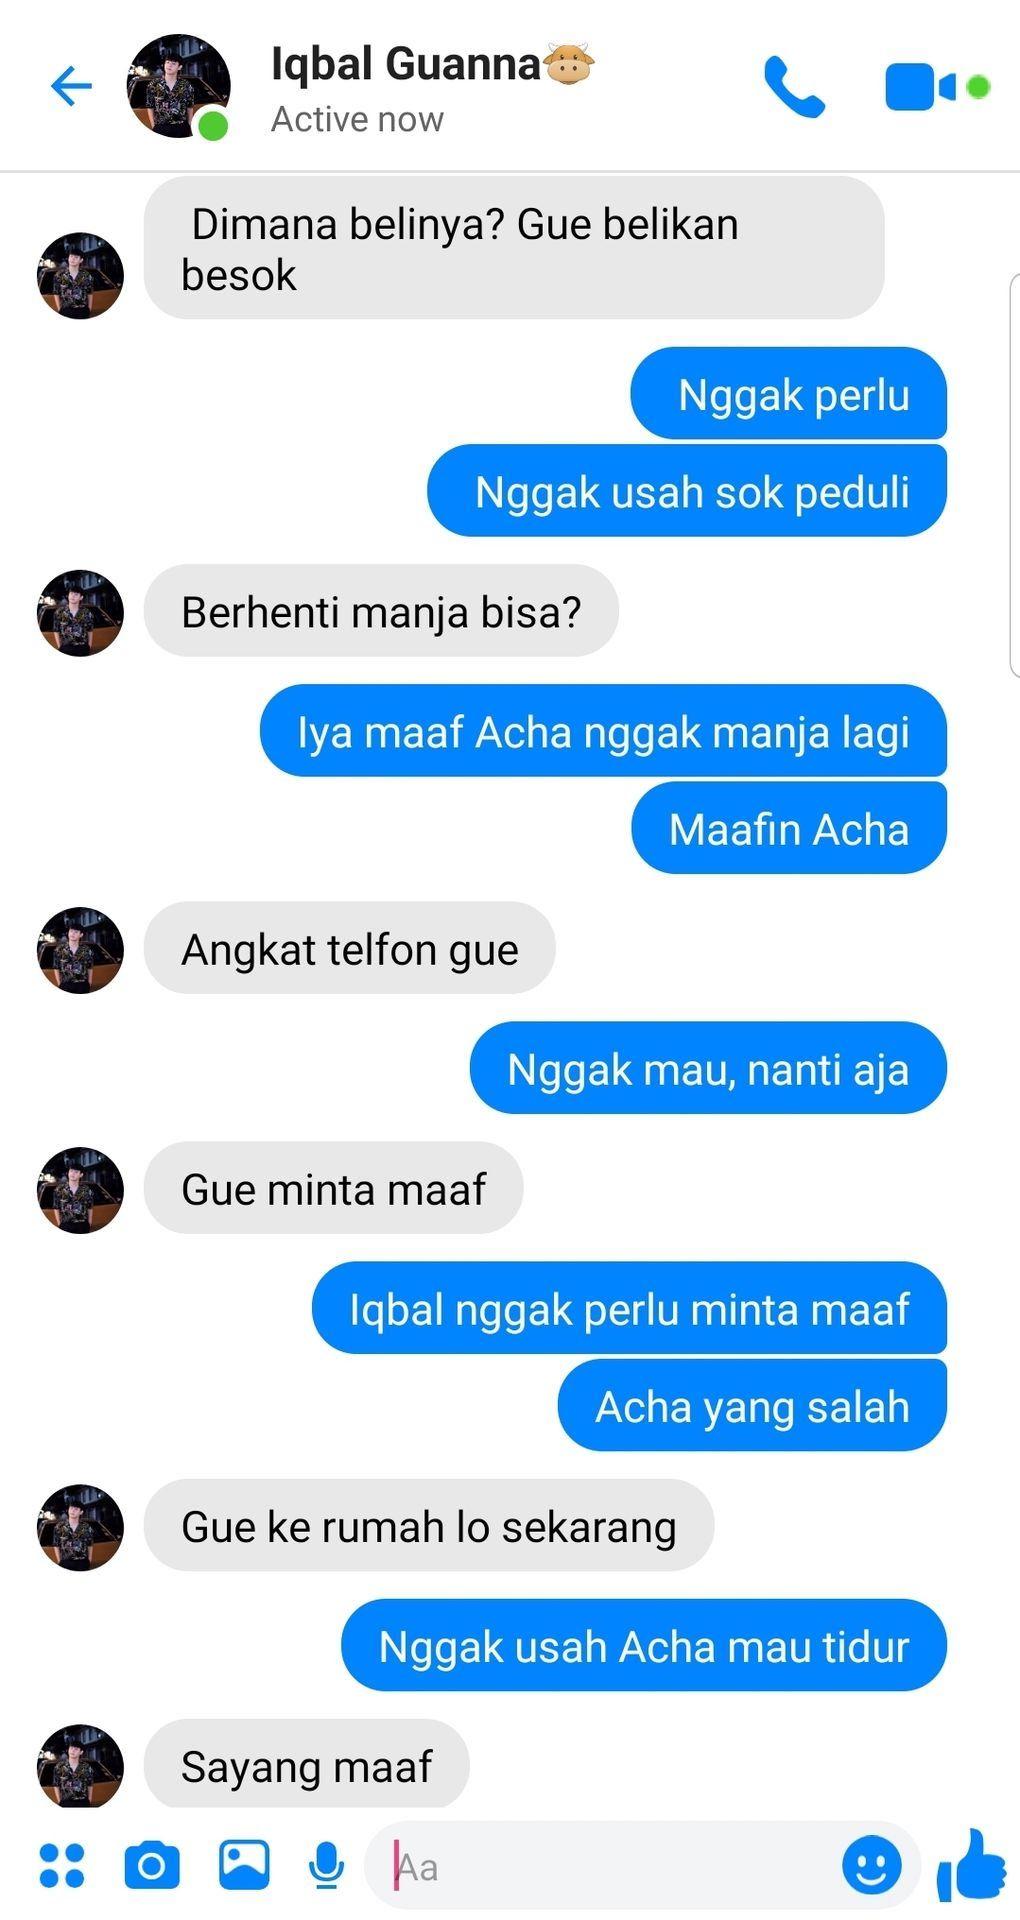 Chat Time Mariposa Ungkapan Lucu Teks Romantis